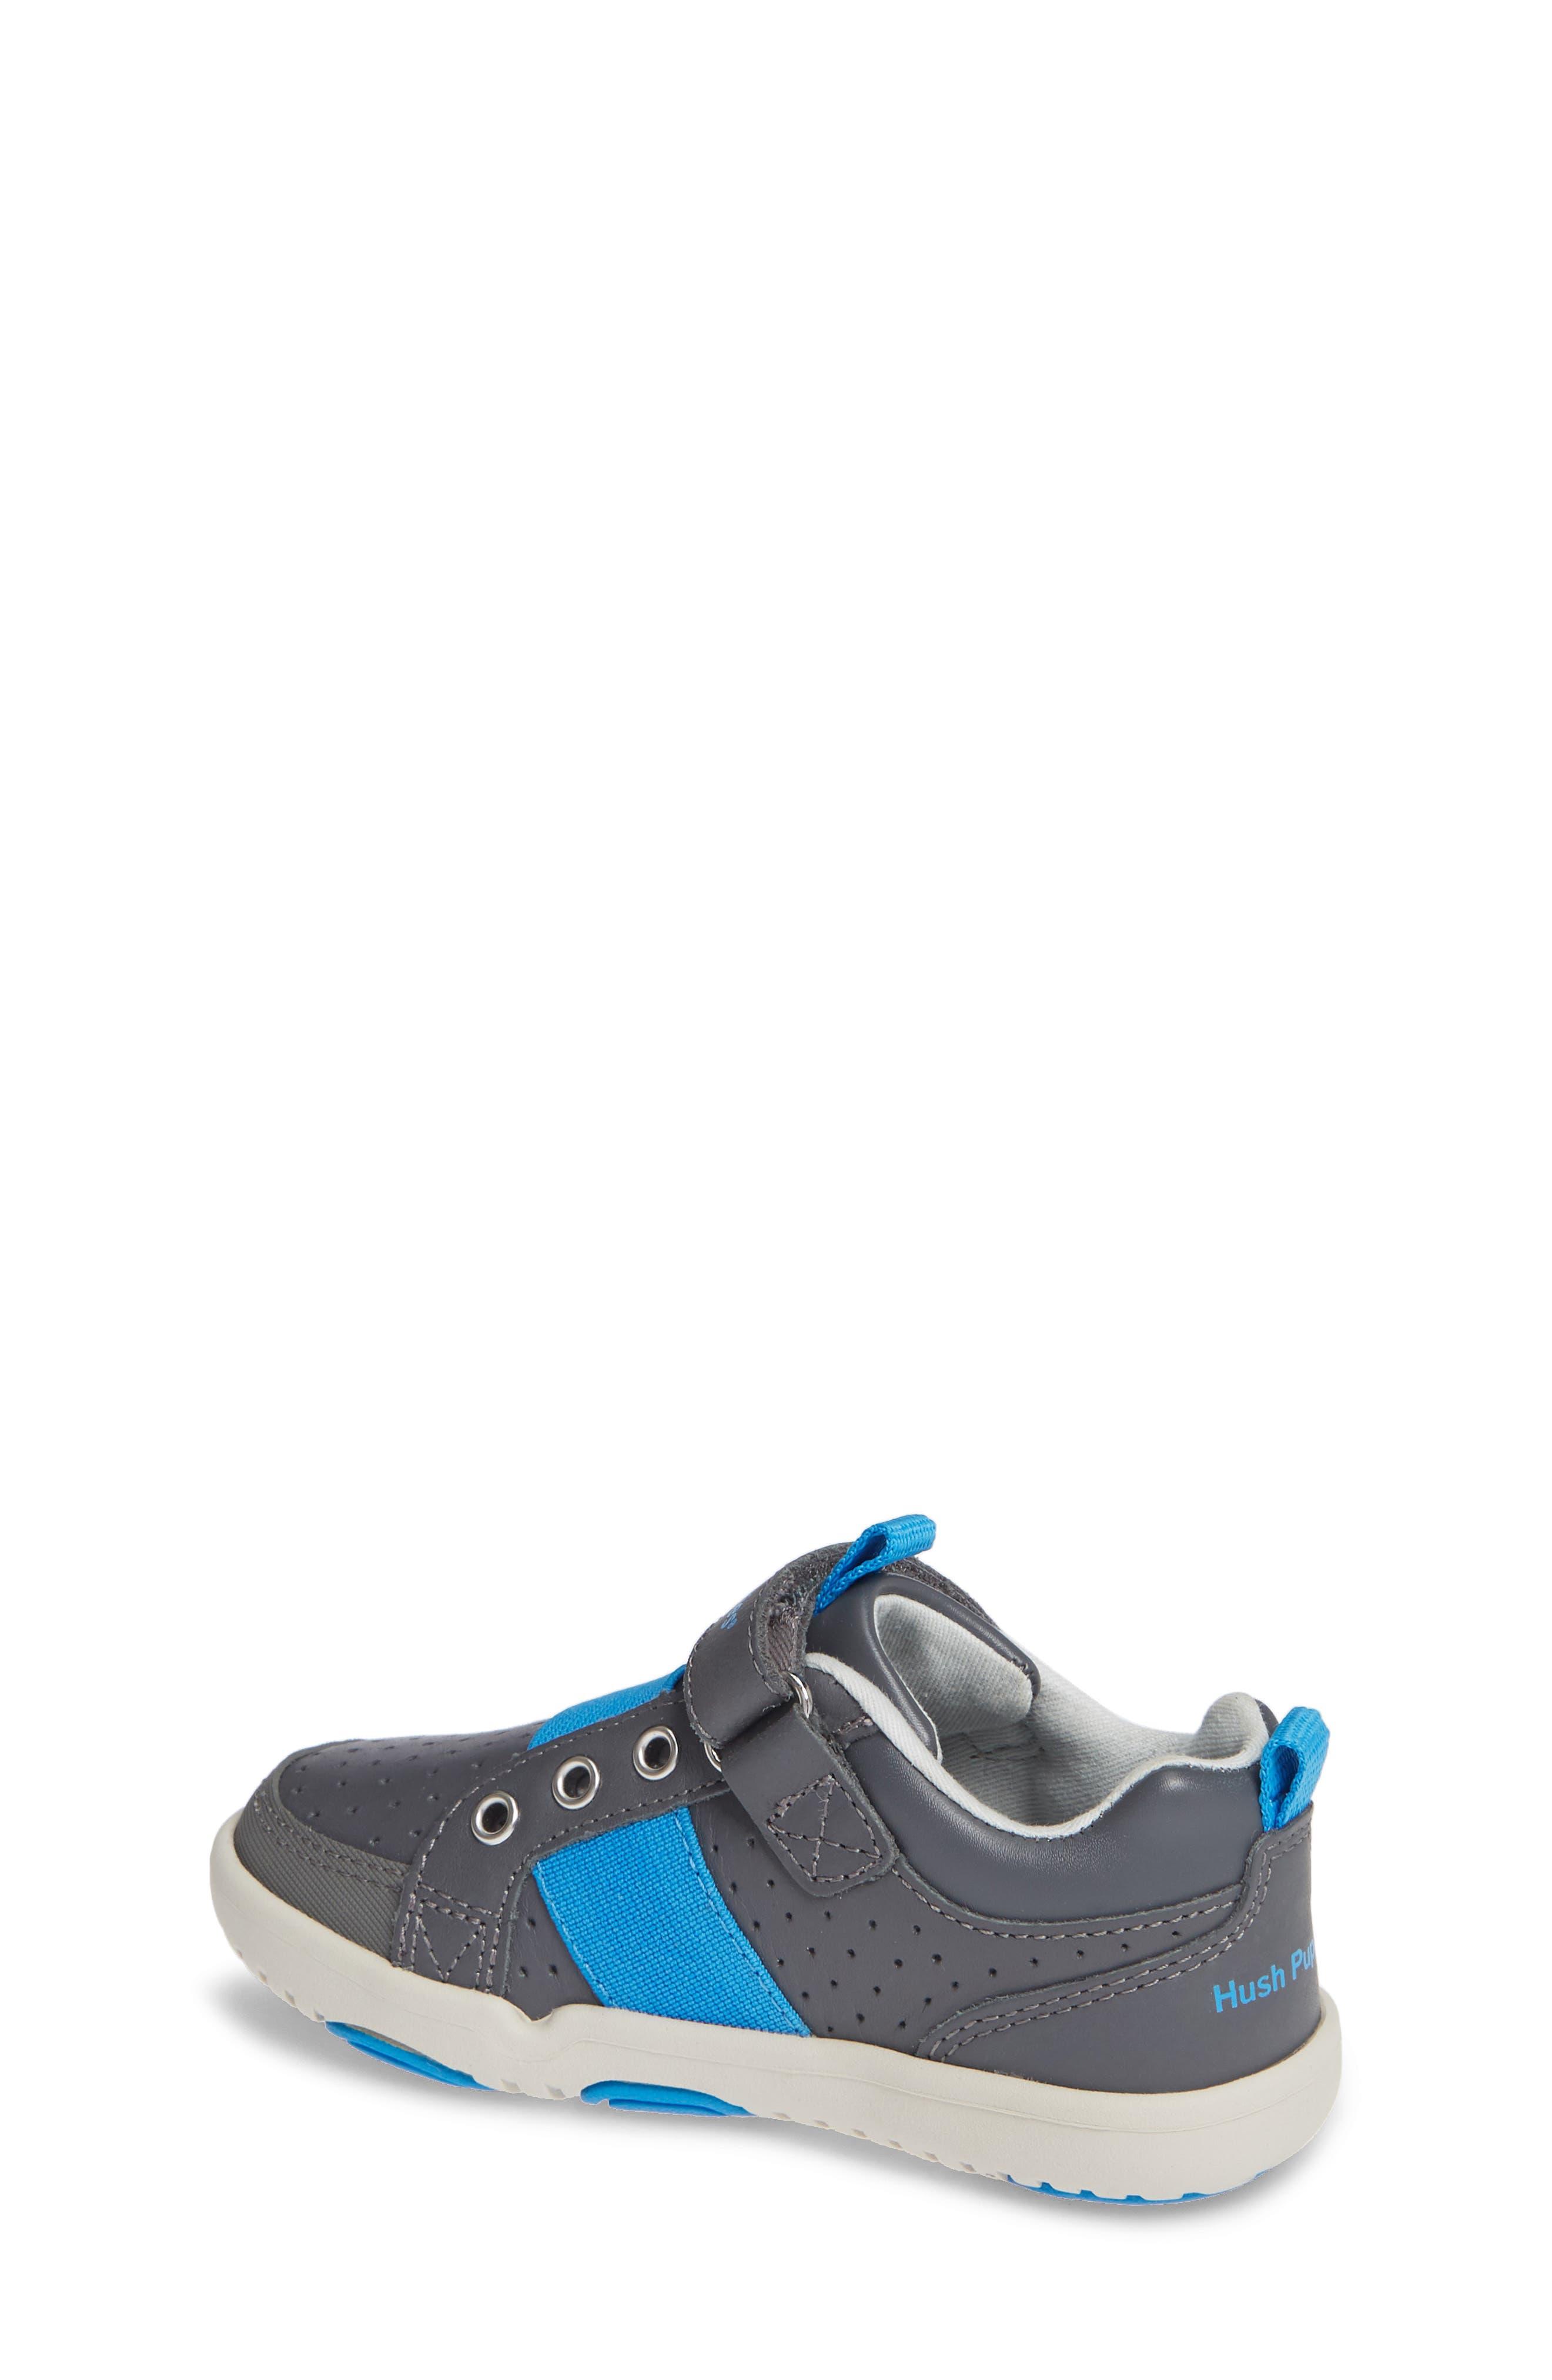 Jesse Sneaker,                             Alternate thumbnail 2, color,                             GREY